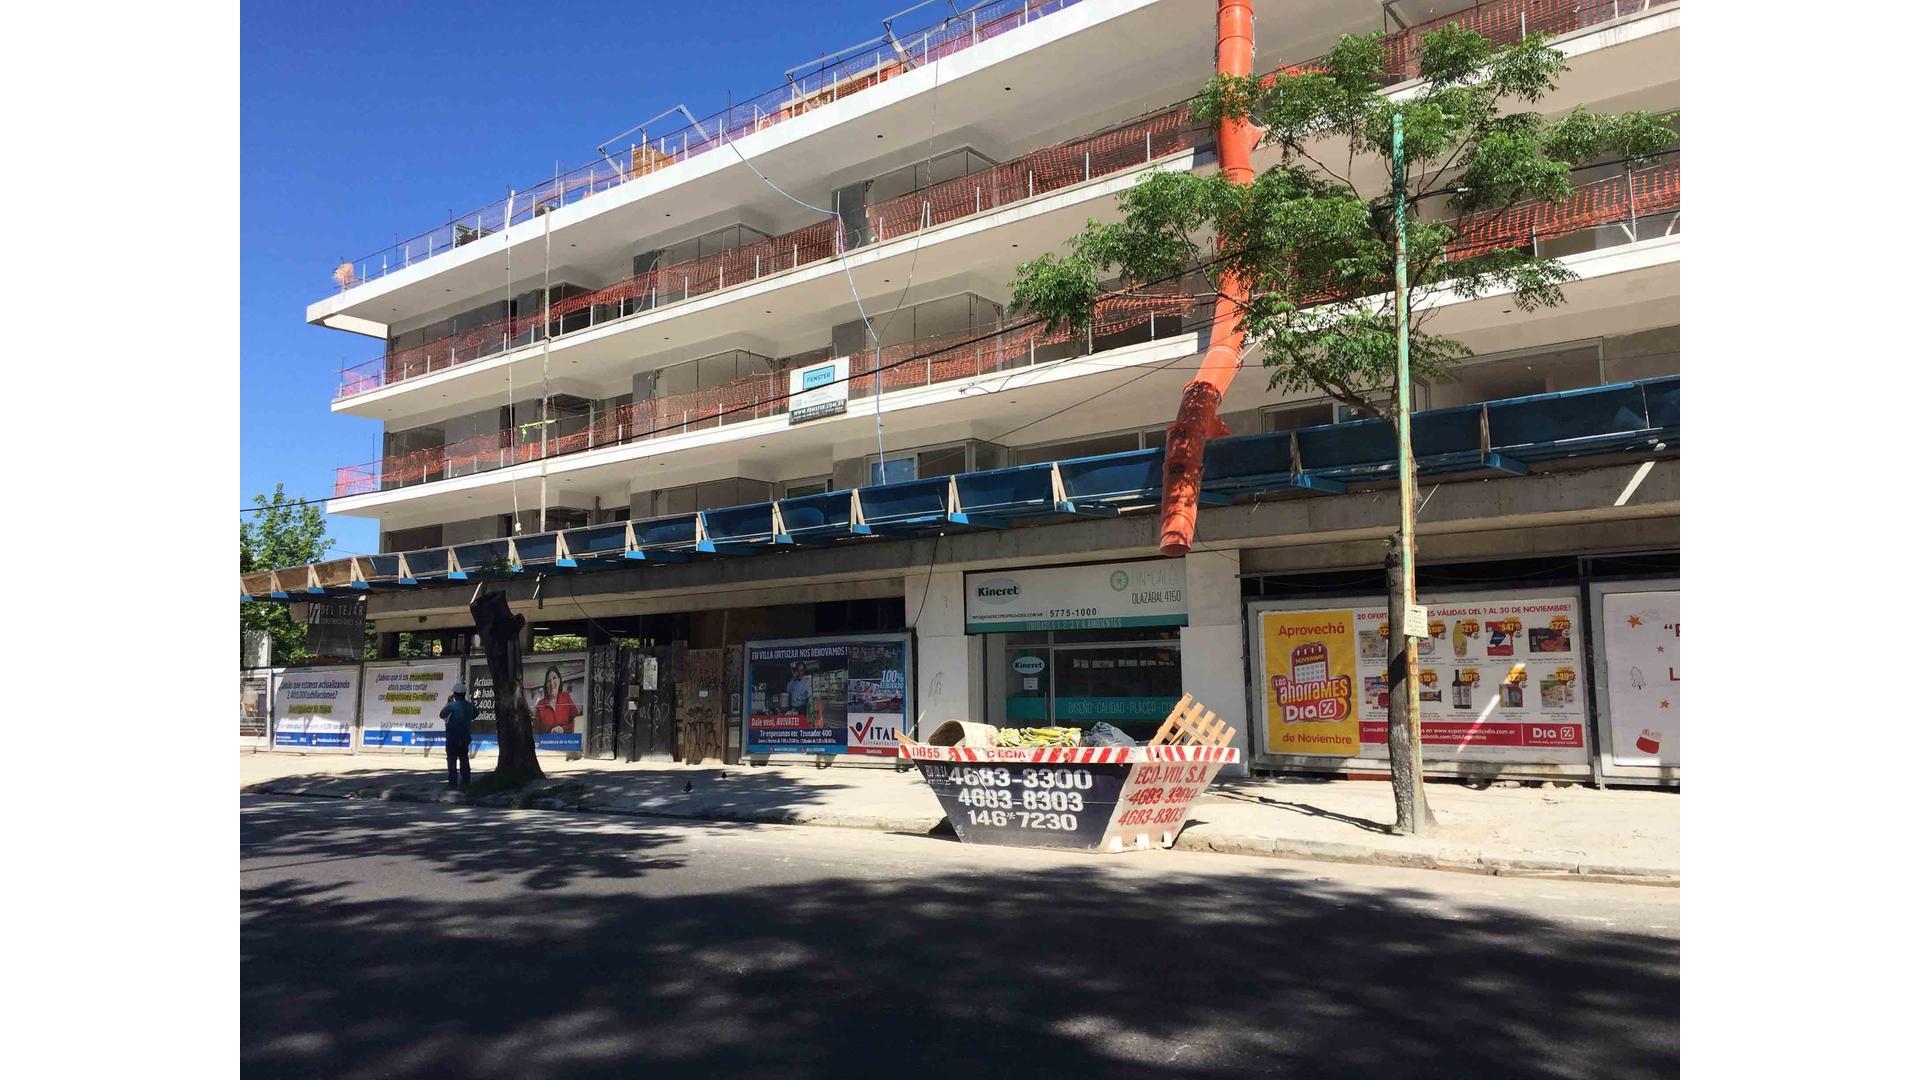 Local - Alquiler - Argentina, Capital Federal - Olazabal  4100